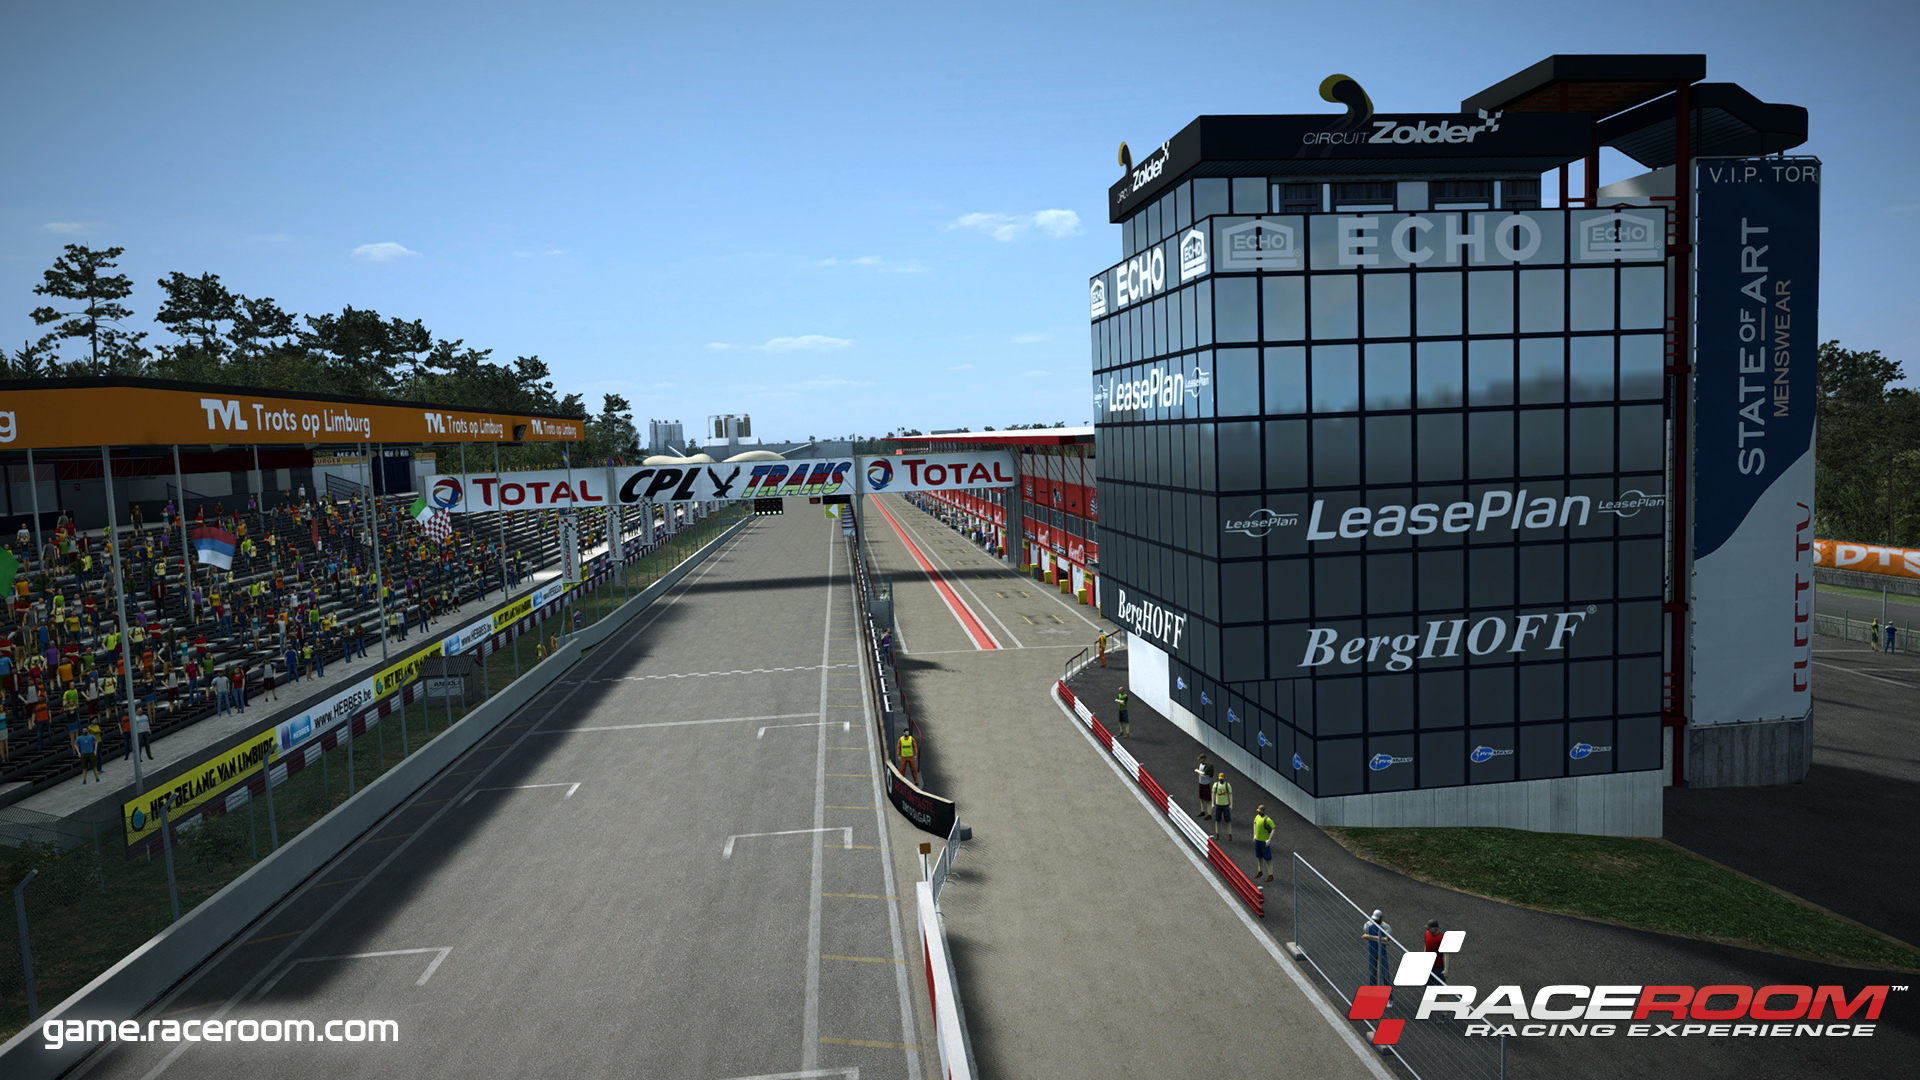 Circuito Zolder Belgica : September belgian truck grand prix circuit zolder